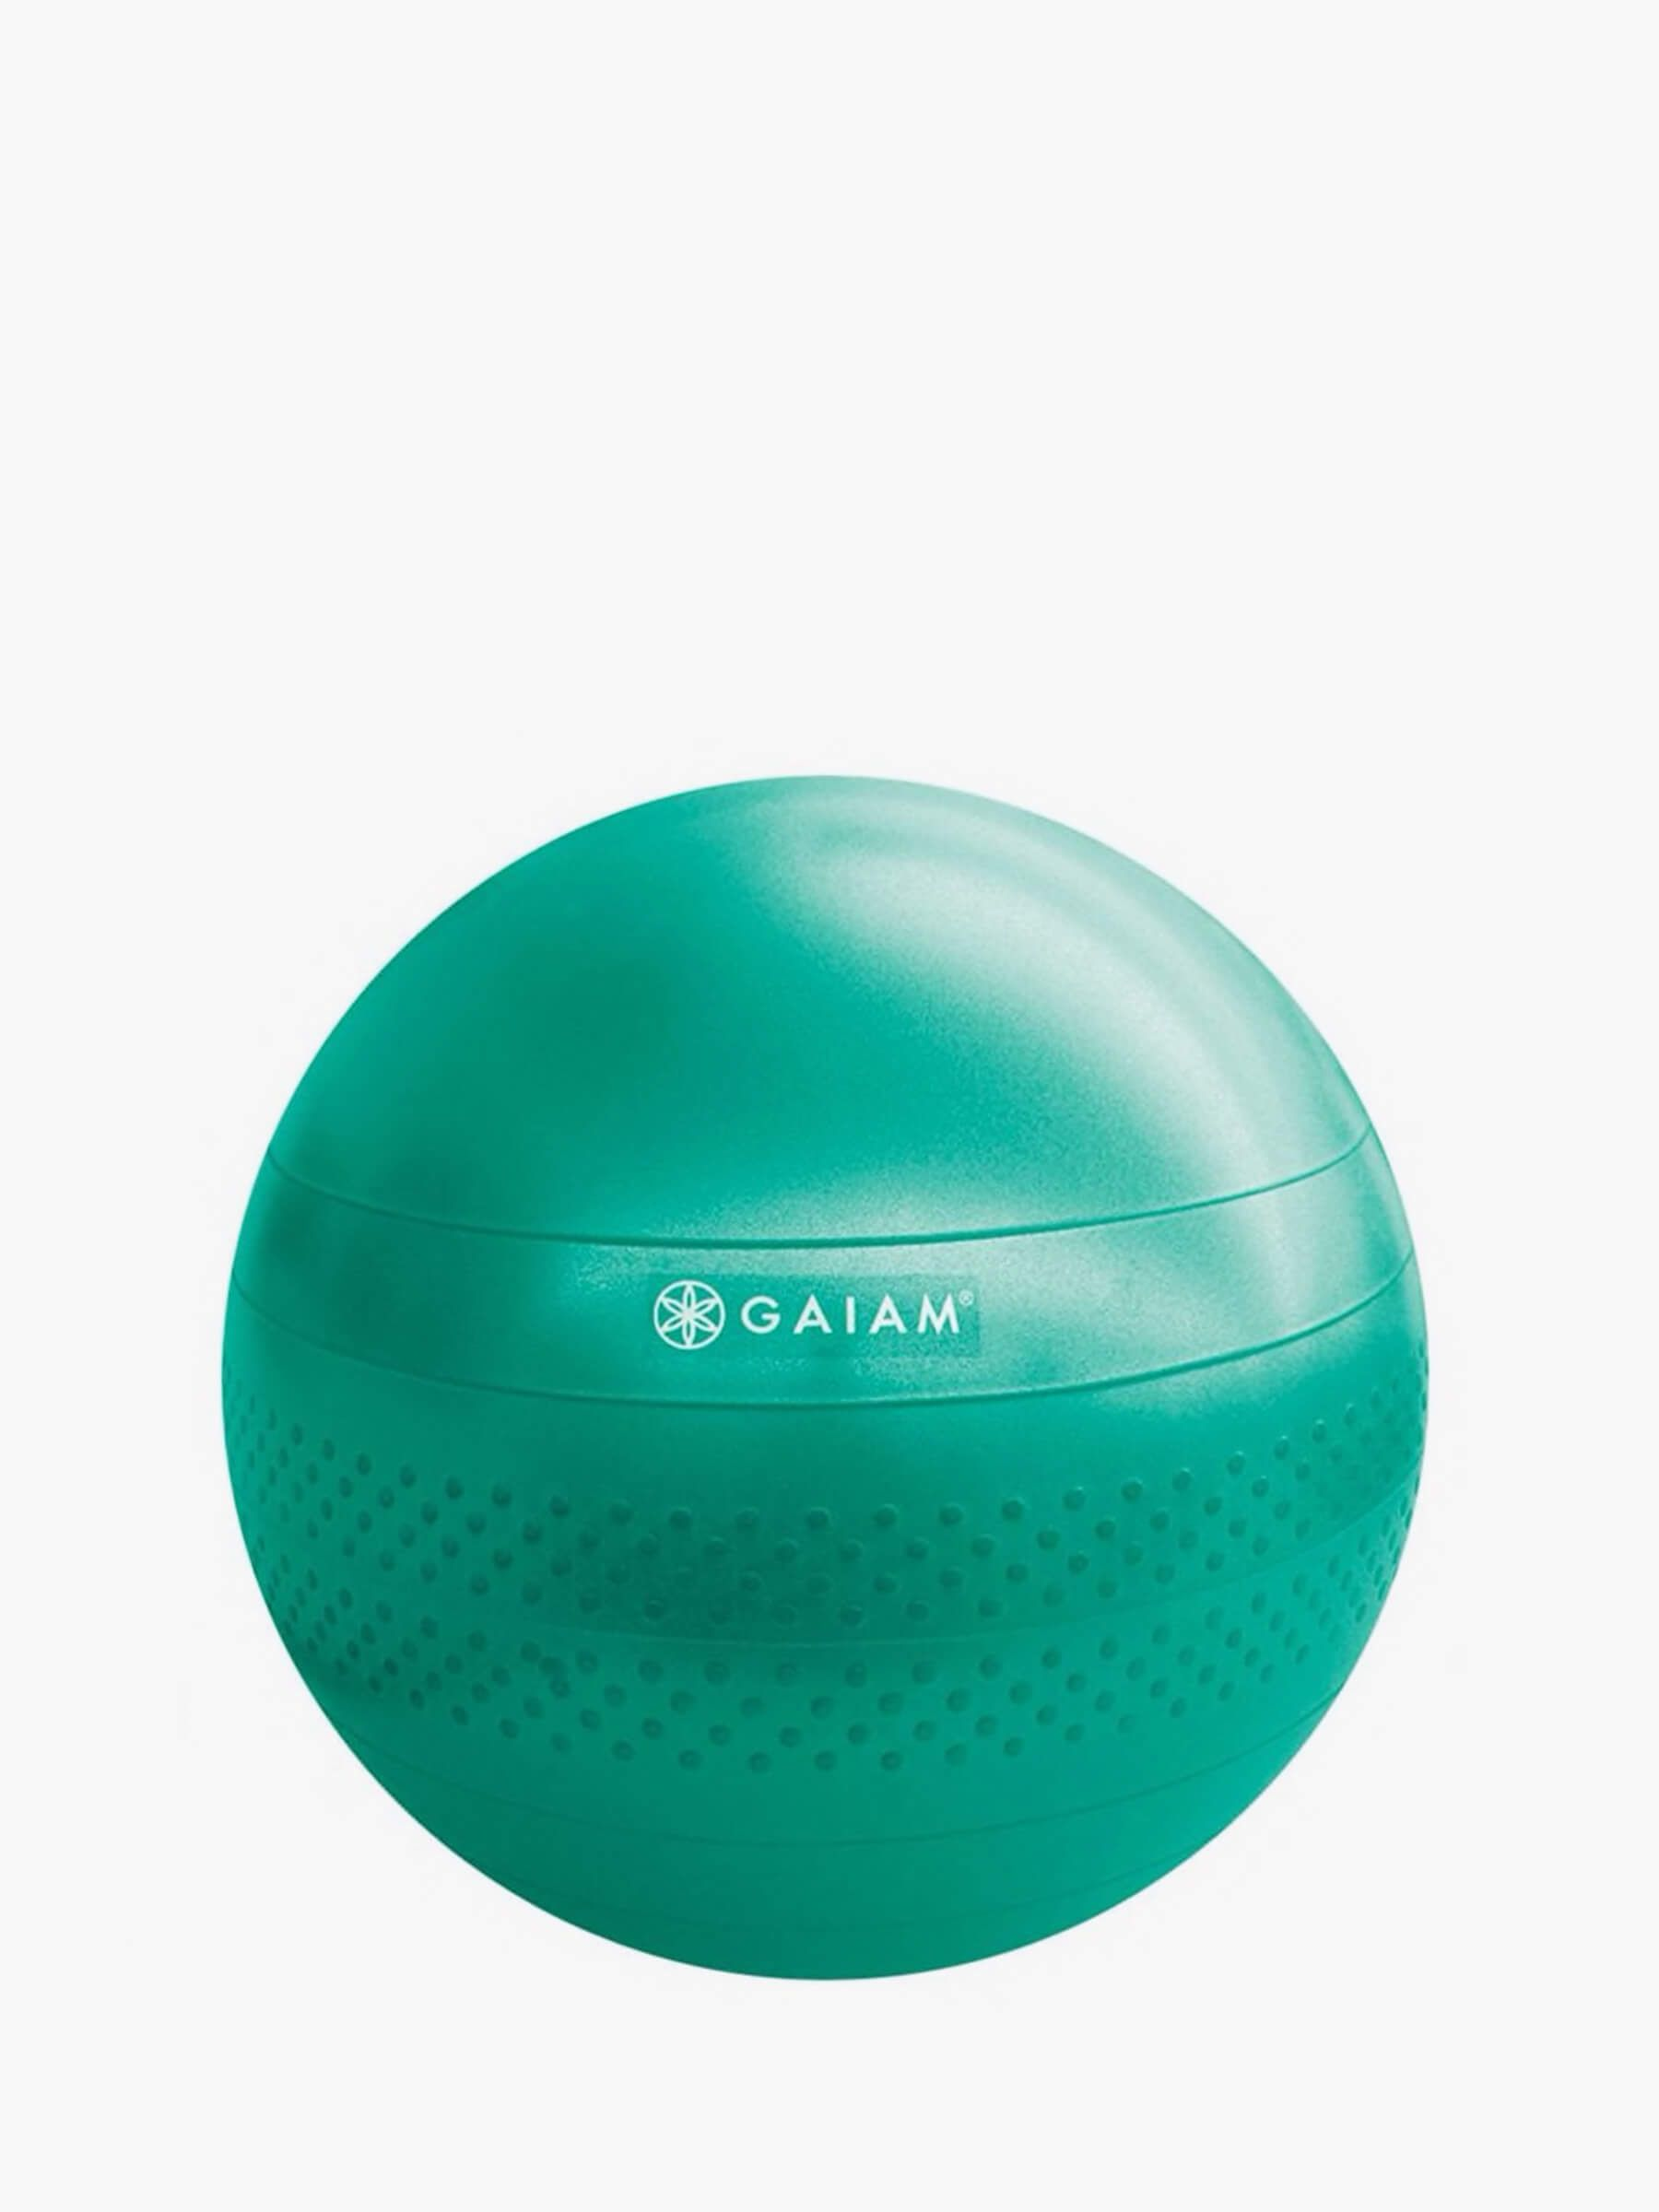 Gaiam Gaiam 65cm Total Body Balance Ball Kit, Green